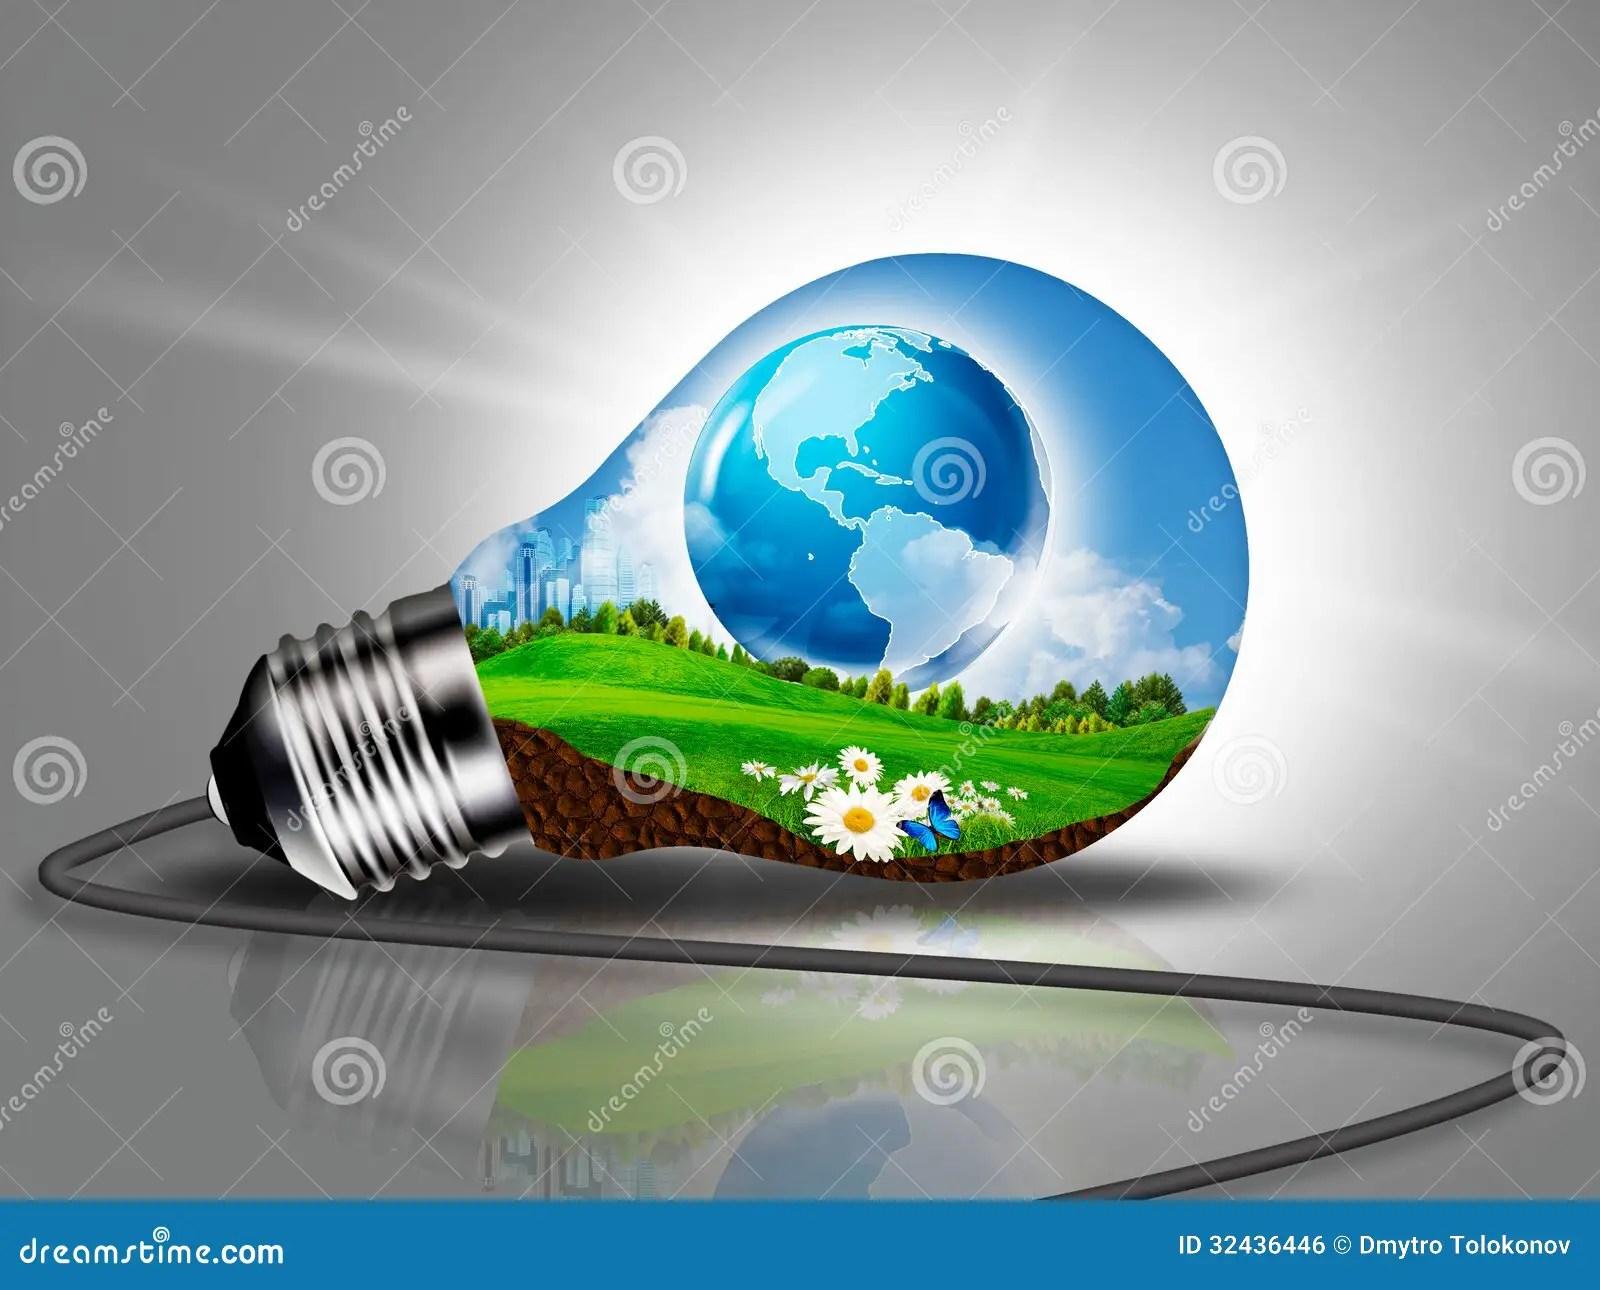 Free Image Light Bulb